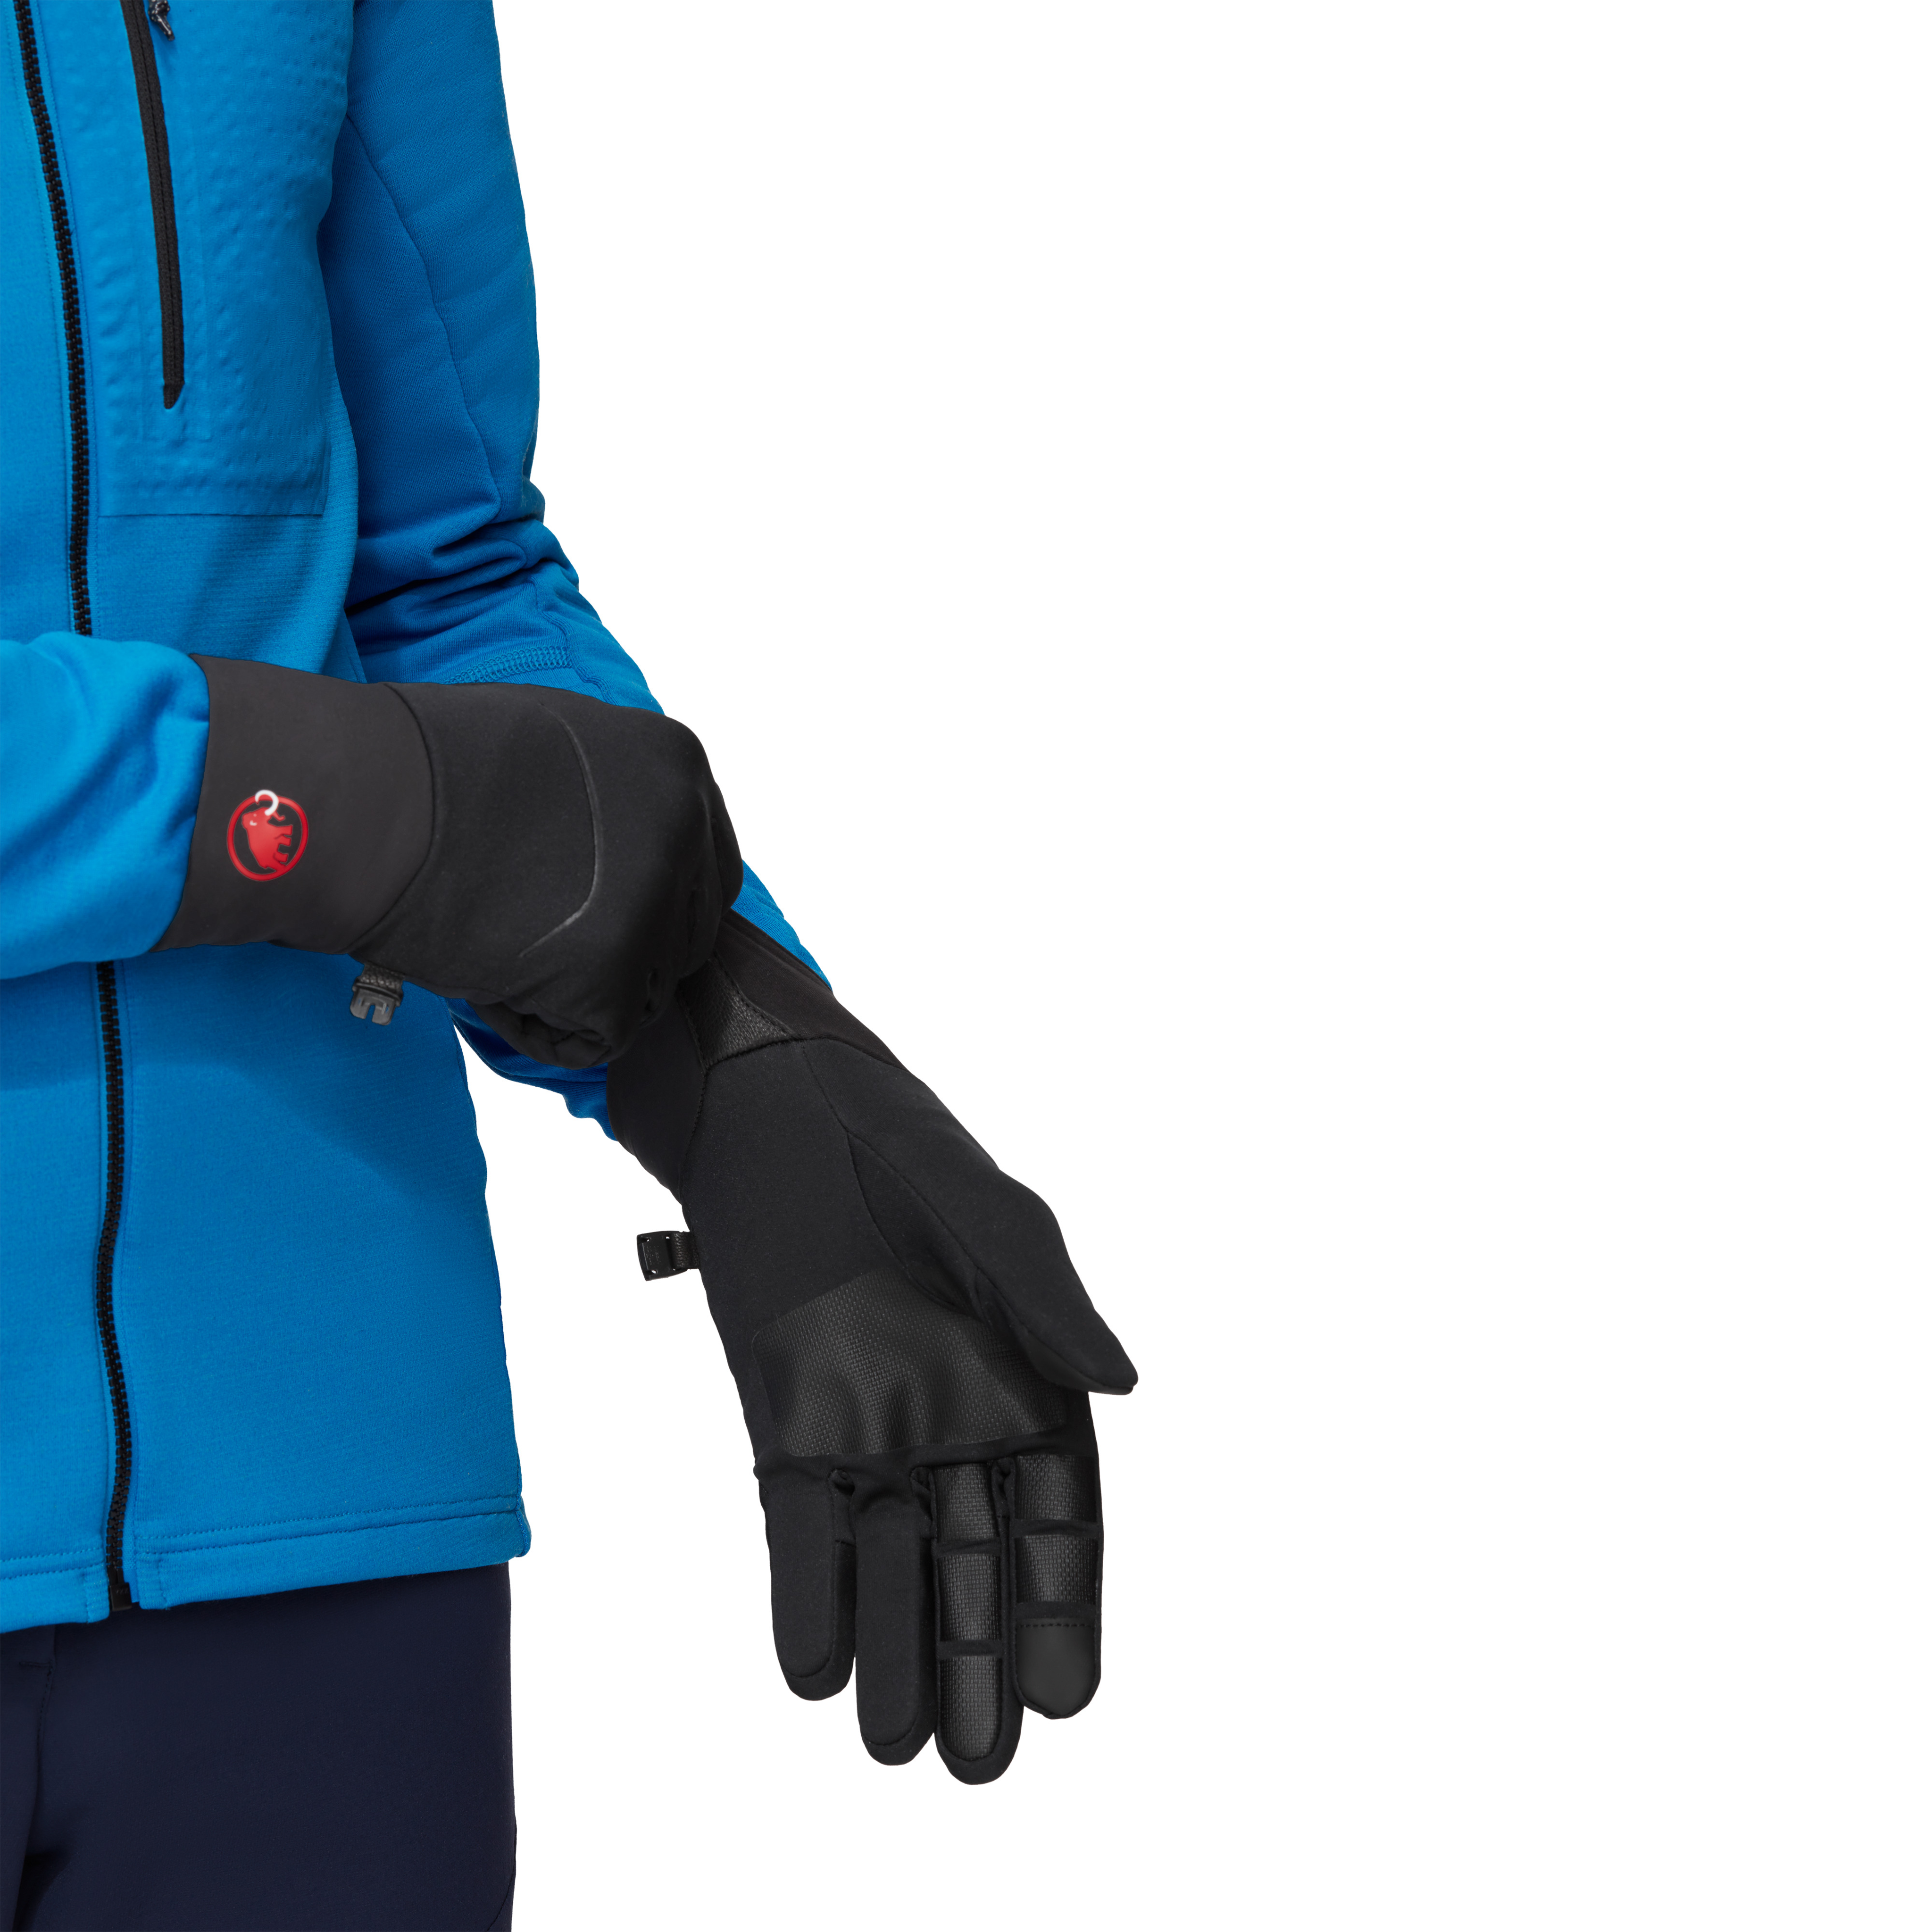 Astro Glove product image